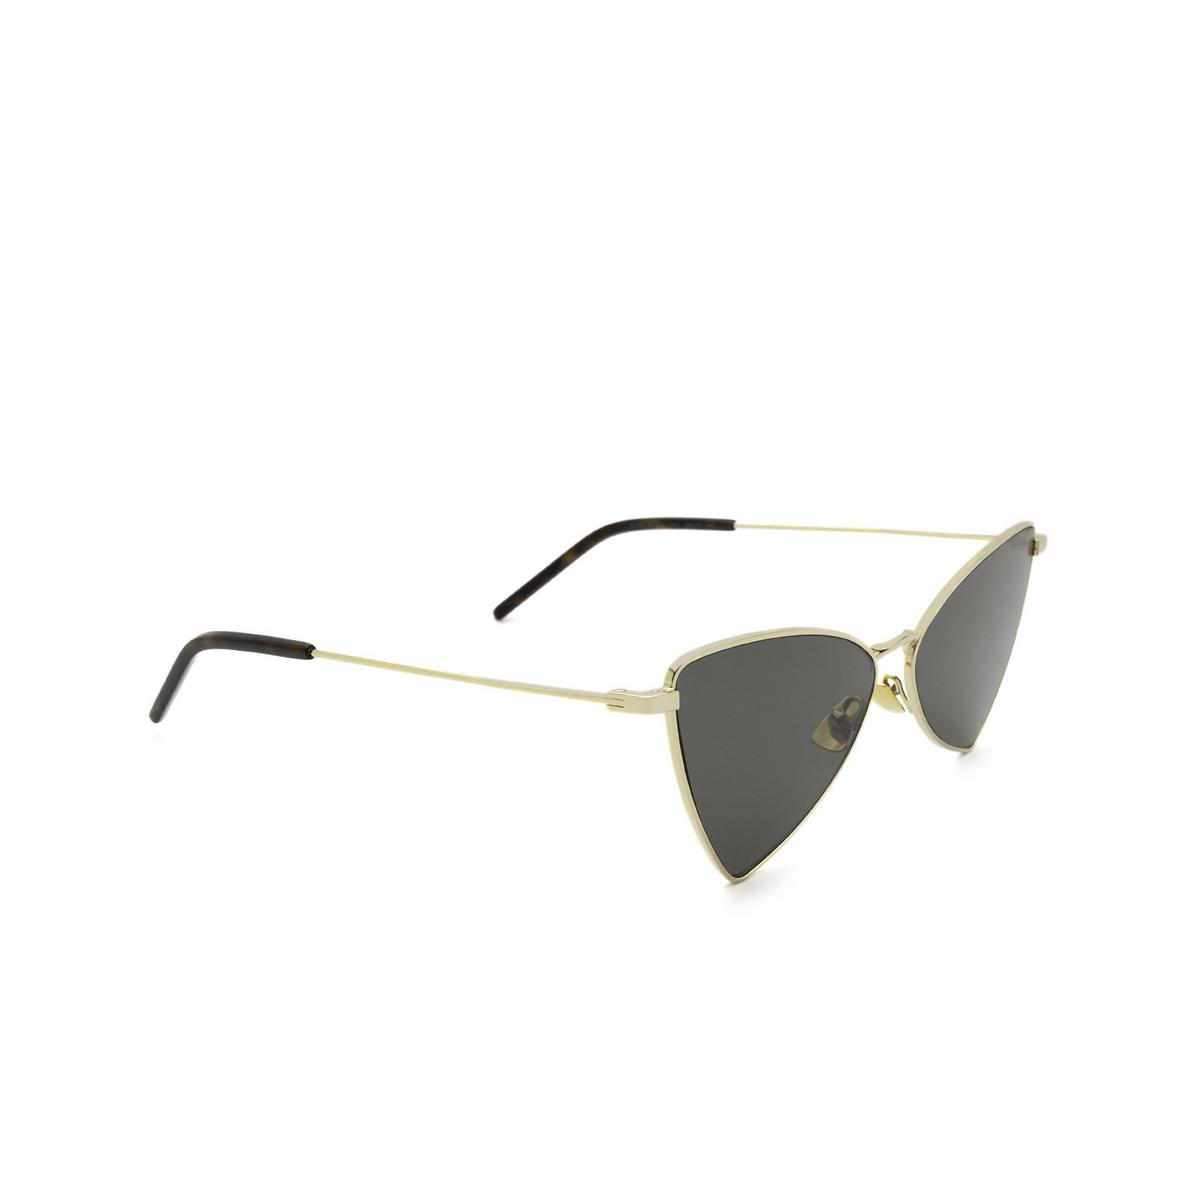 Saint Laurent® Irregular Sunglasses: Jerry SL 303 color Gold 004 - three-quarters view.